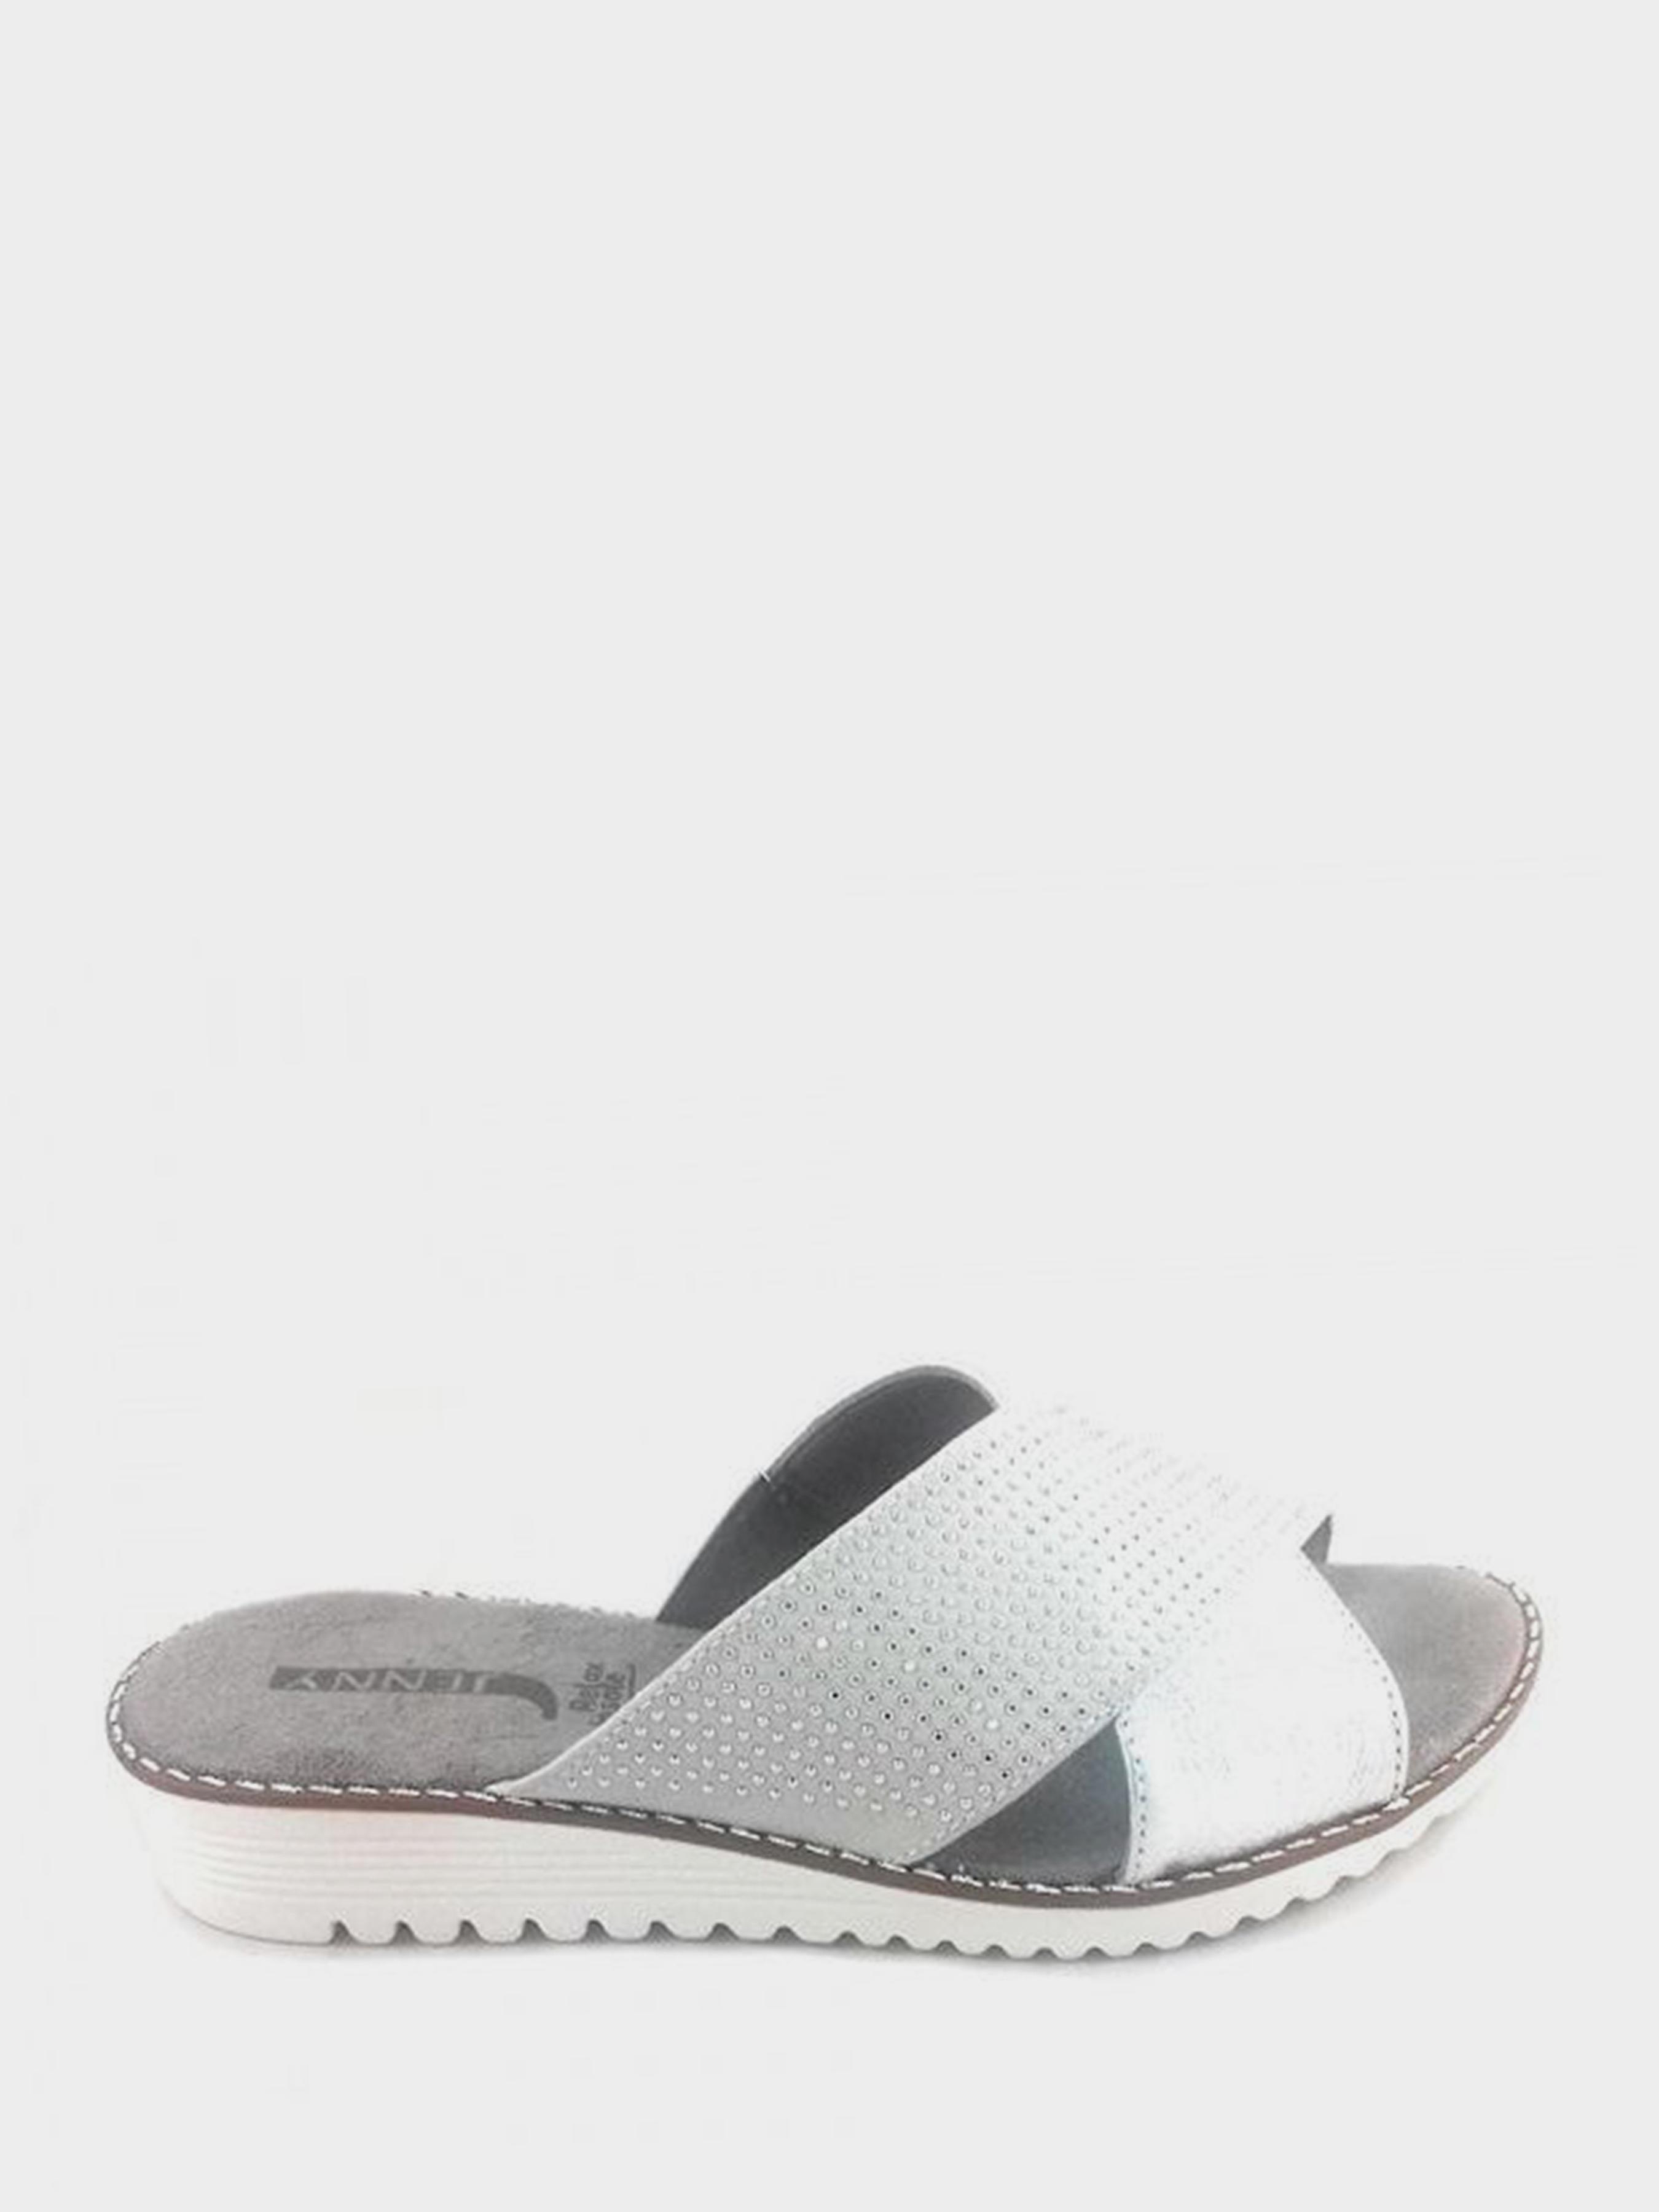 Шлёпанцы женские Jenny by ARA AJ638 размеры обуви, 2017